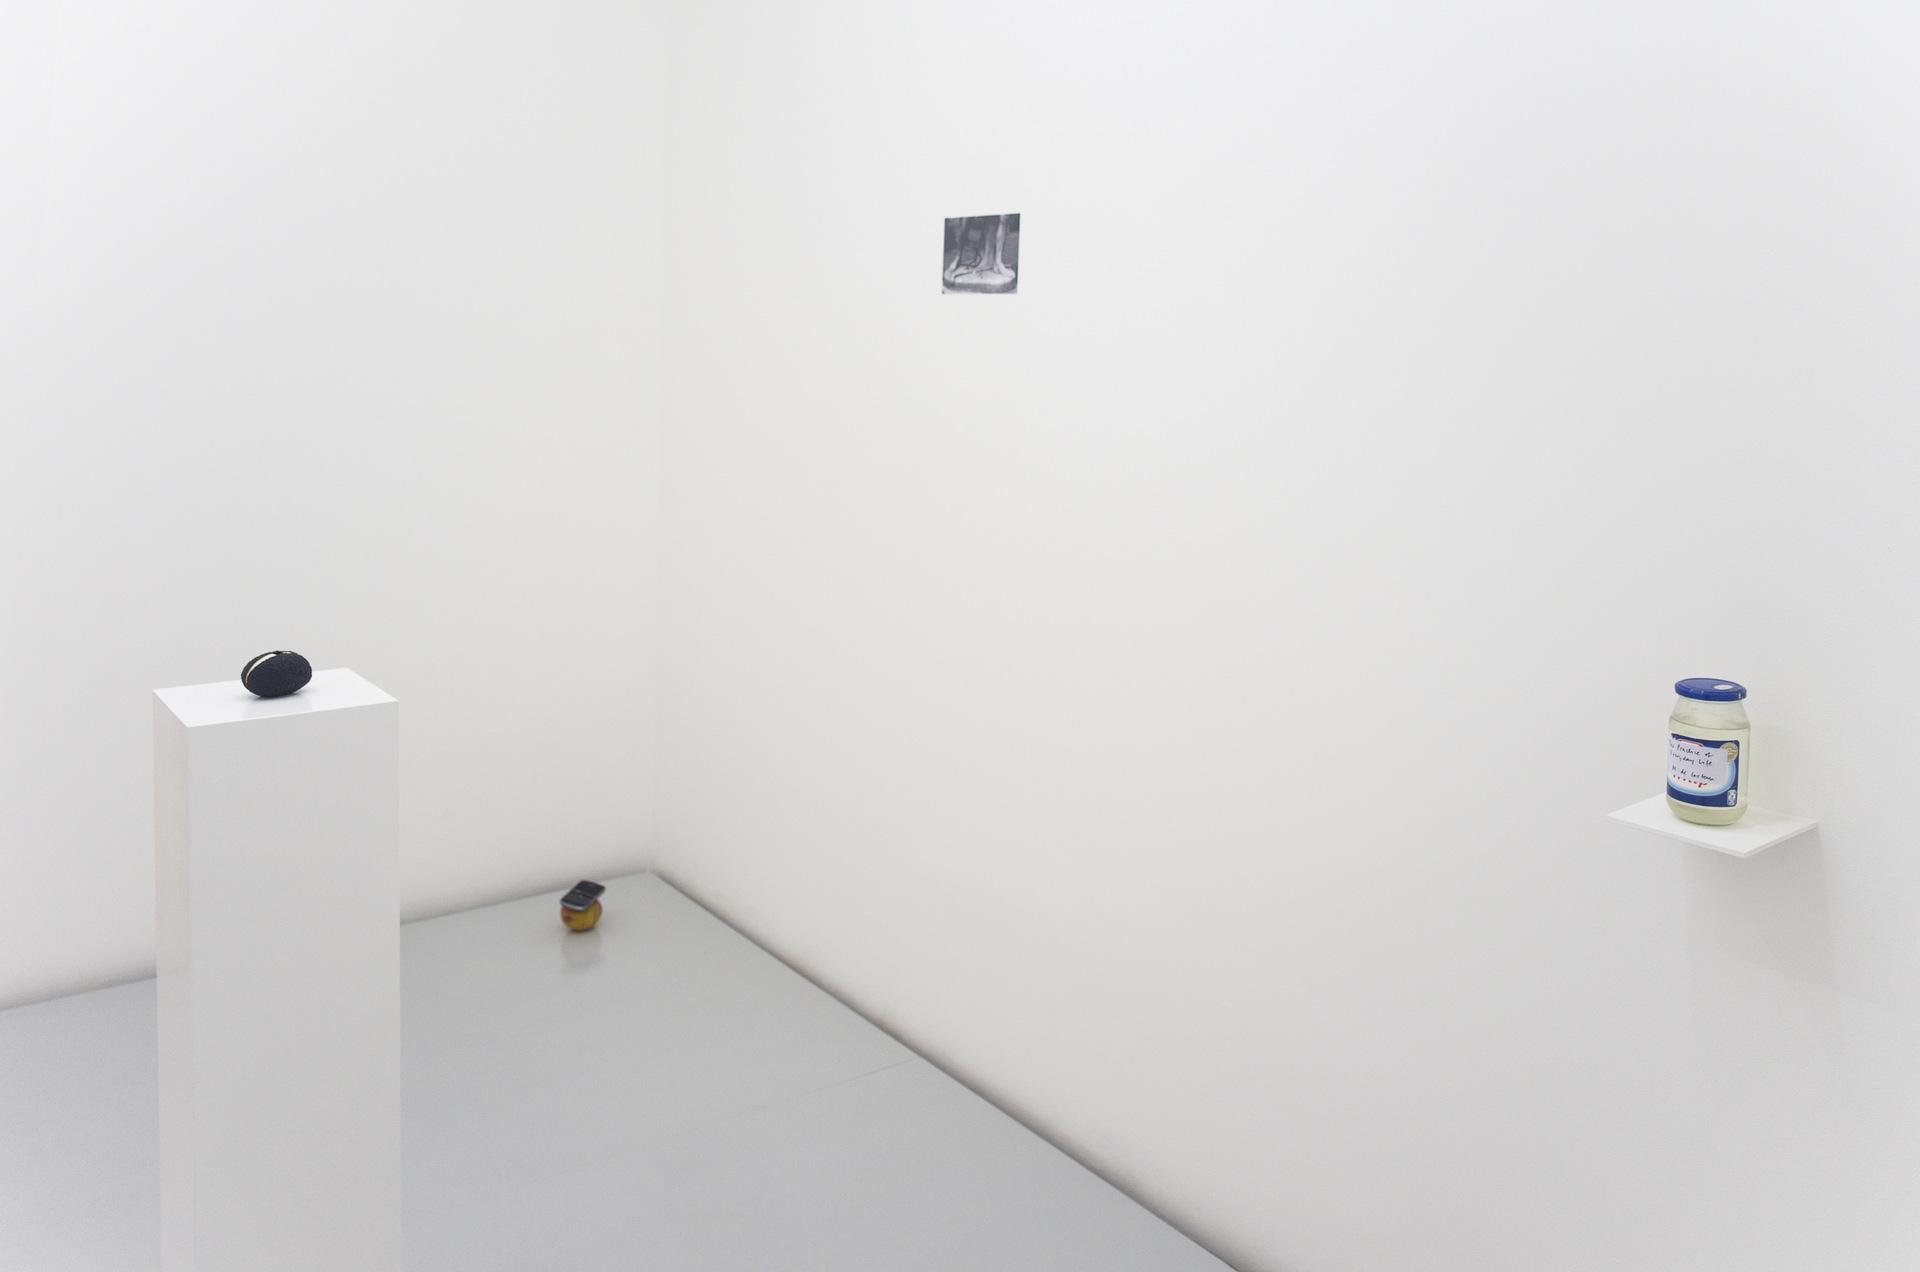 17 Install Climent Pieroth da Anda Prieto